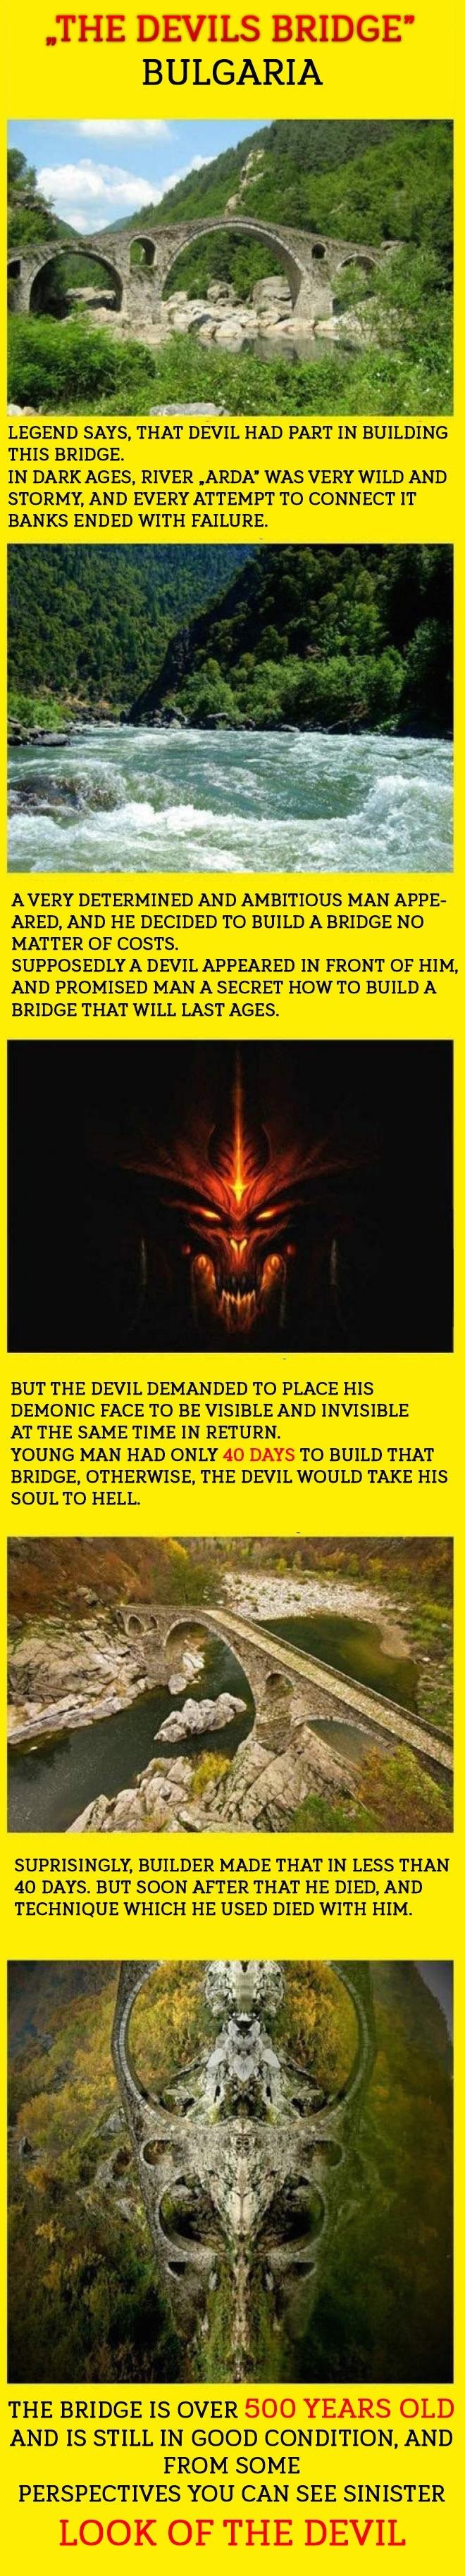 The devil's bridge